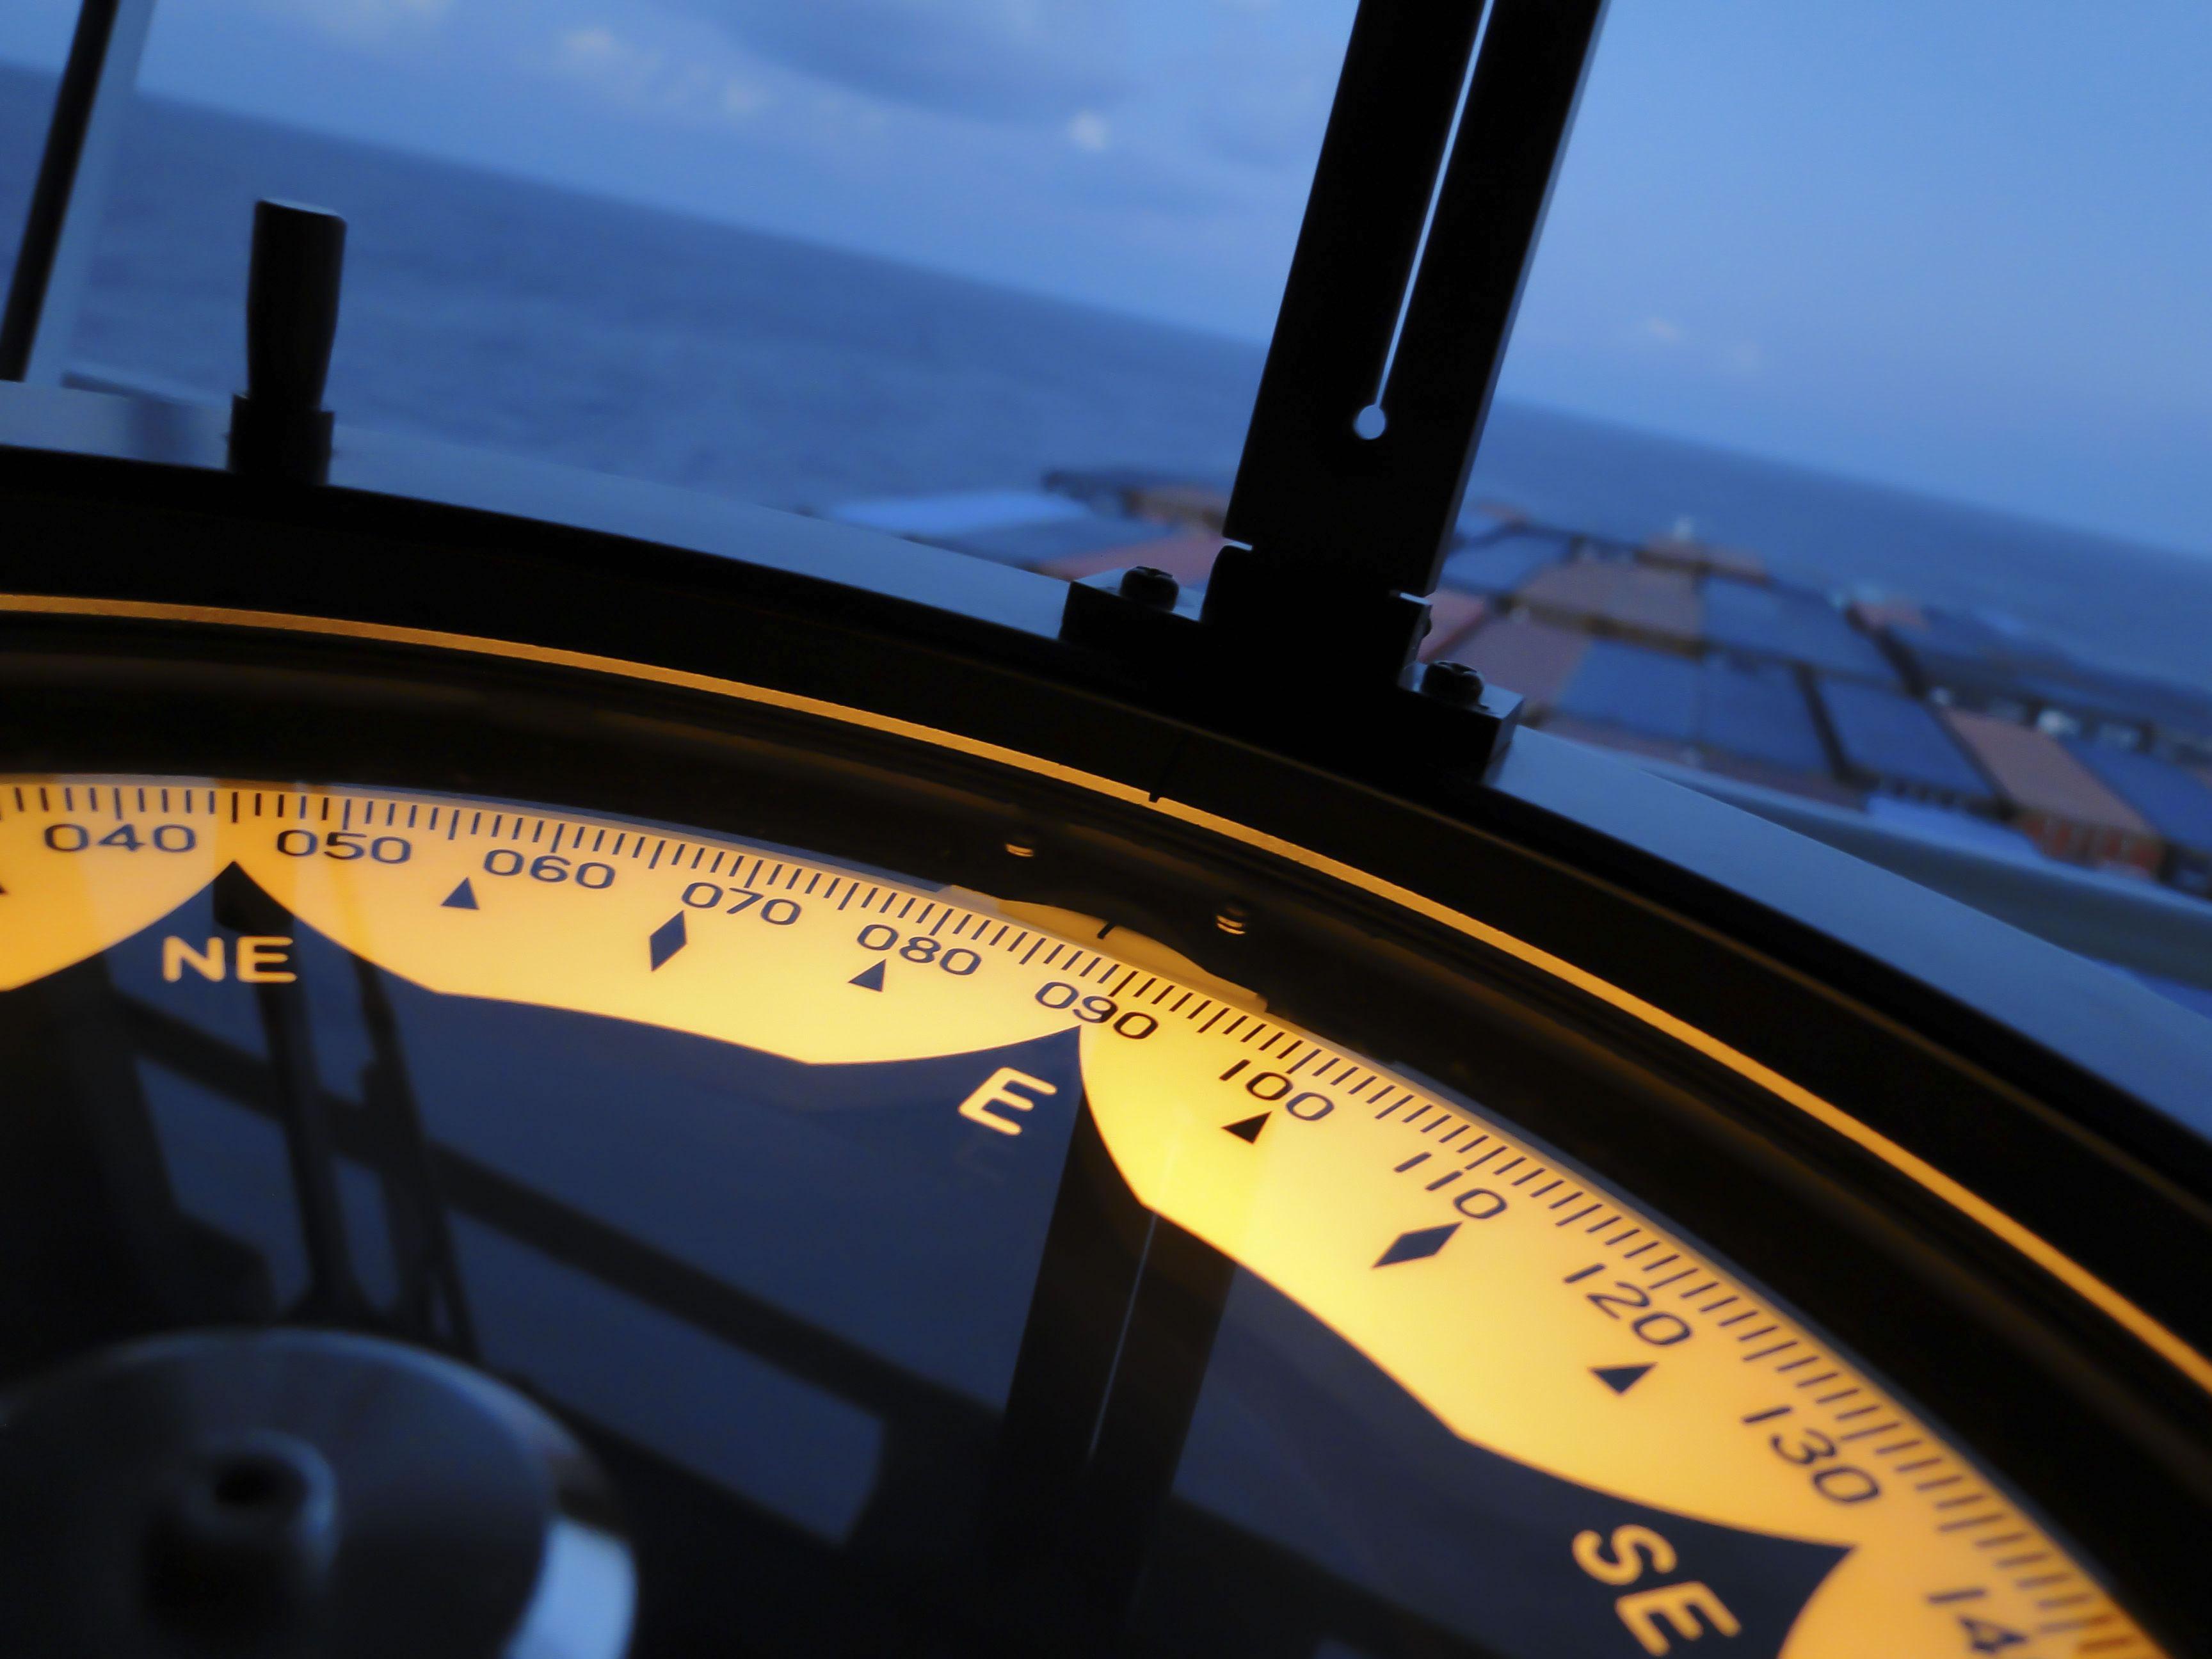 Marine gyroscopes typically use angular contact ball bearings